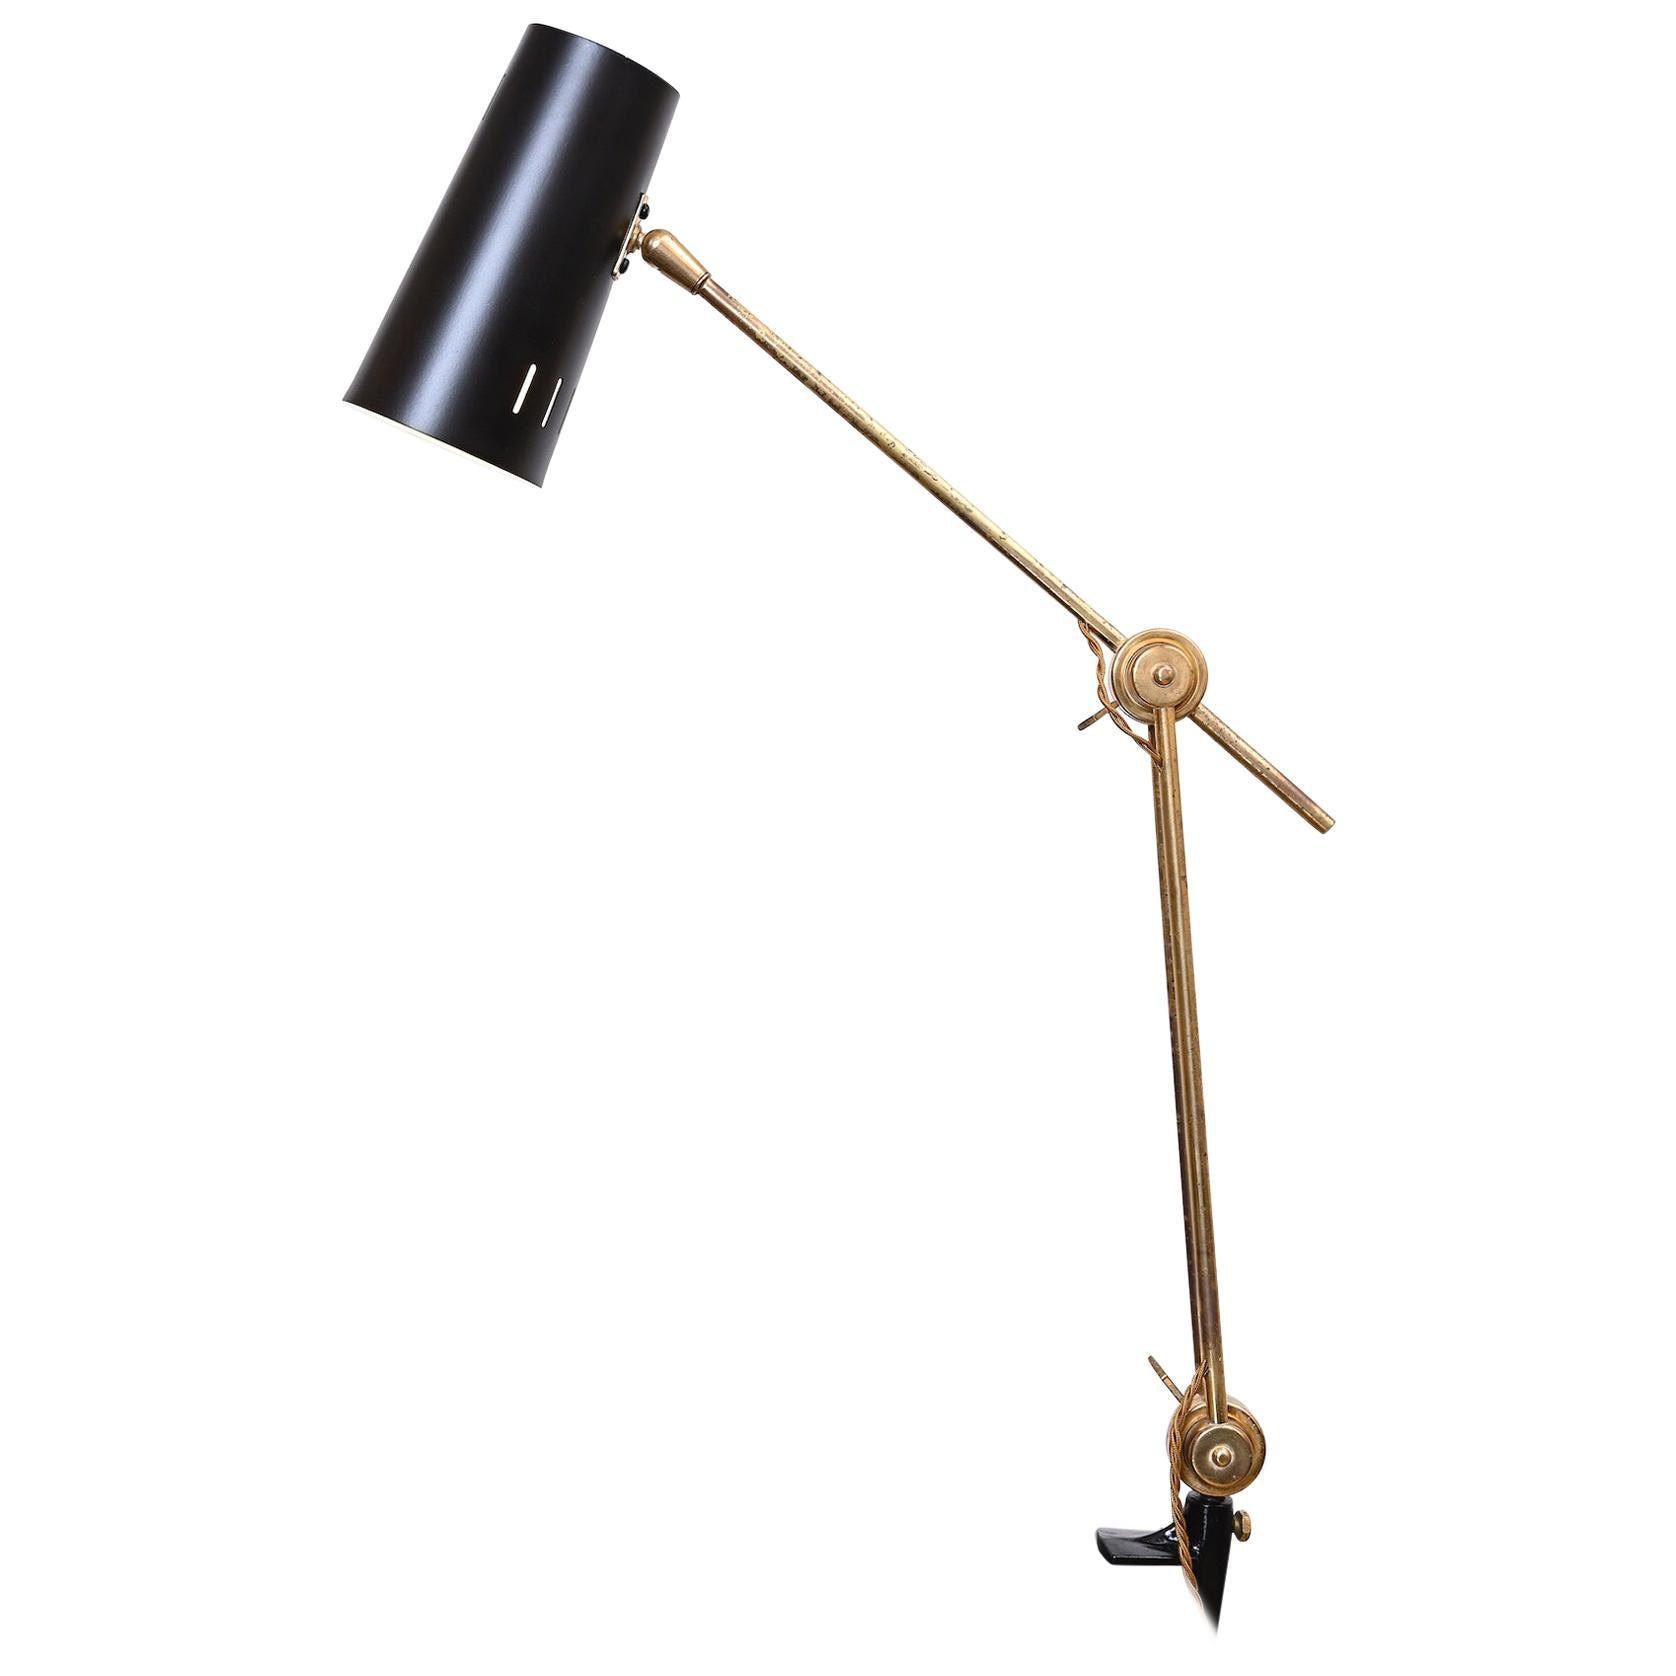 Rare Stilnovo Clamp Desk Lamp, circa 1950